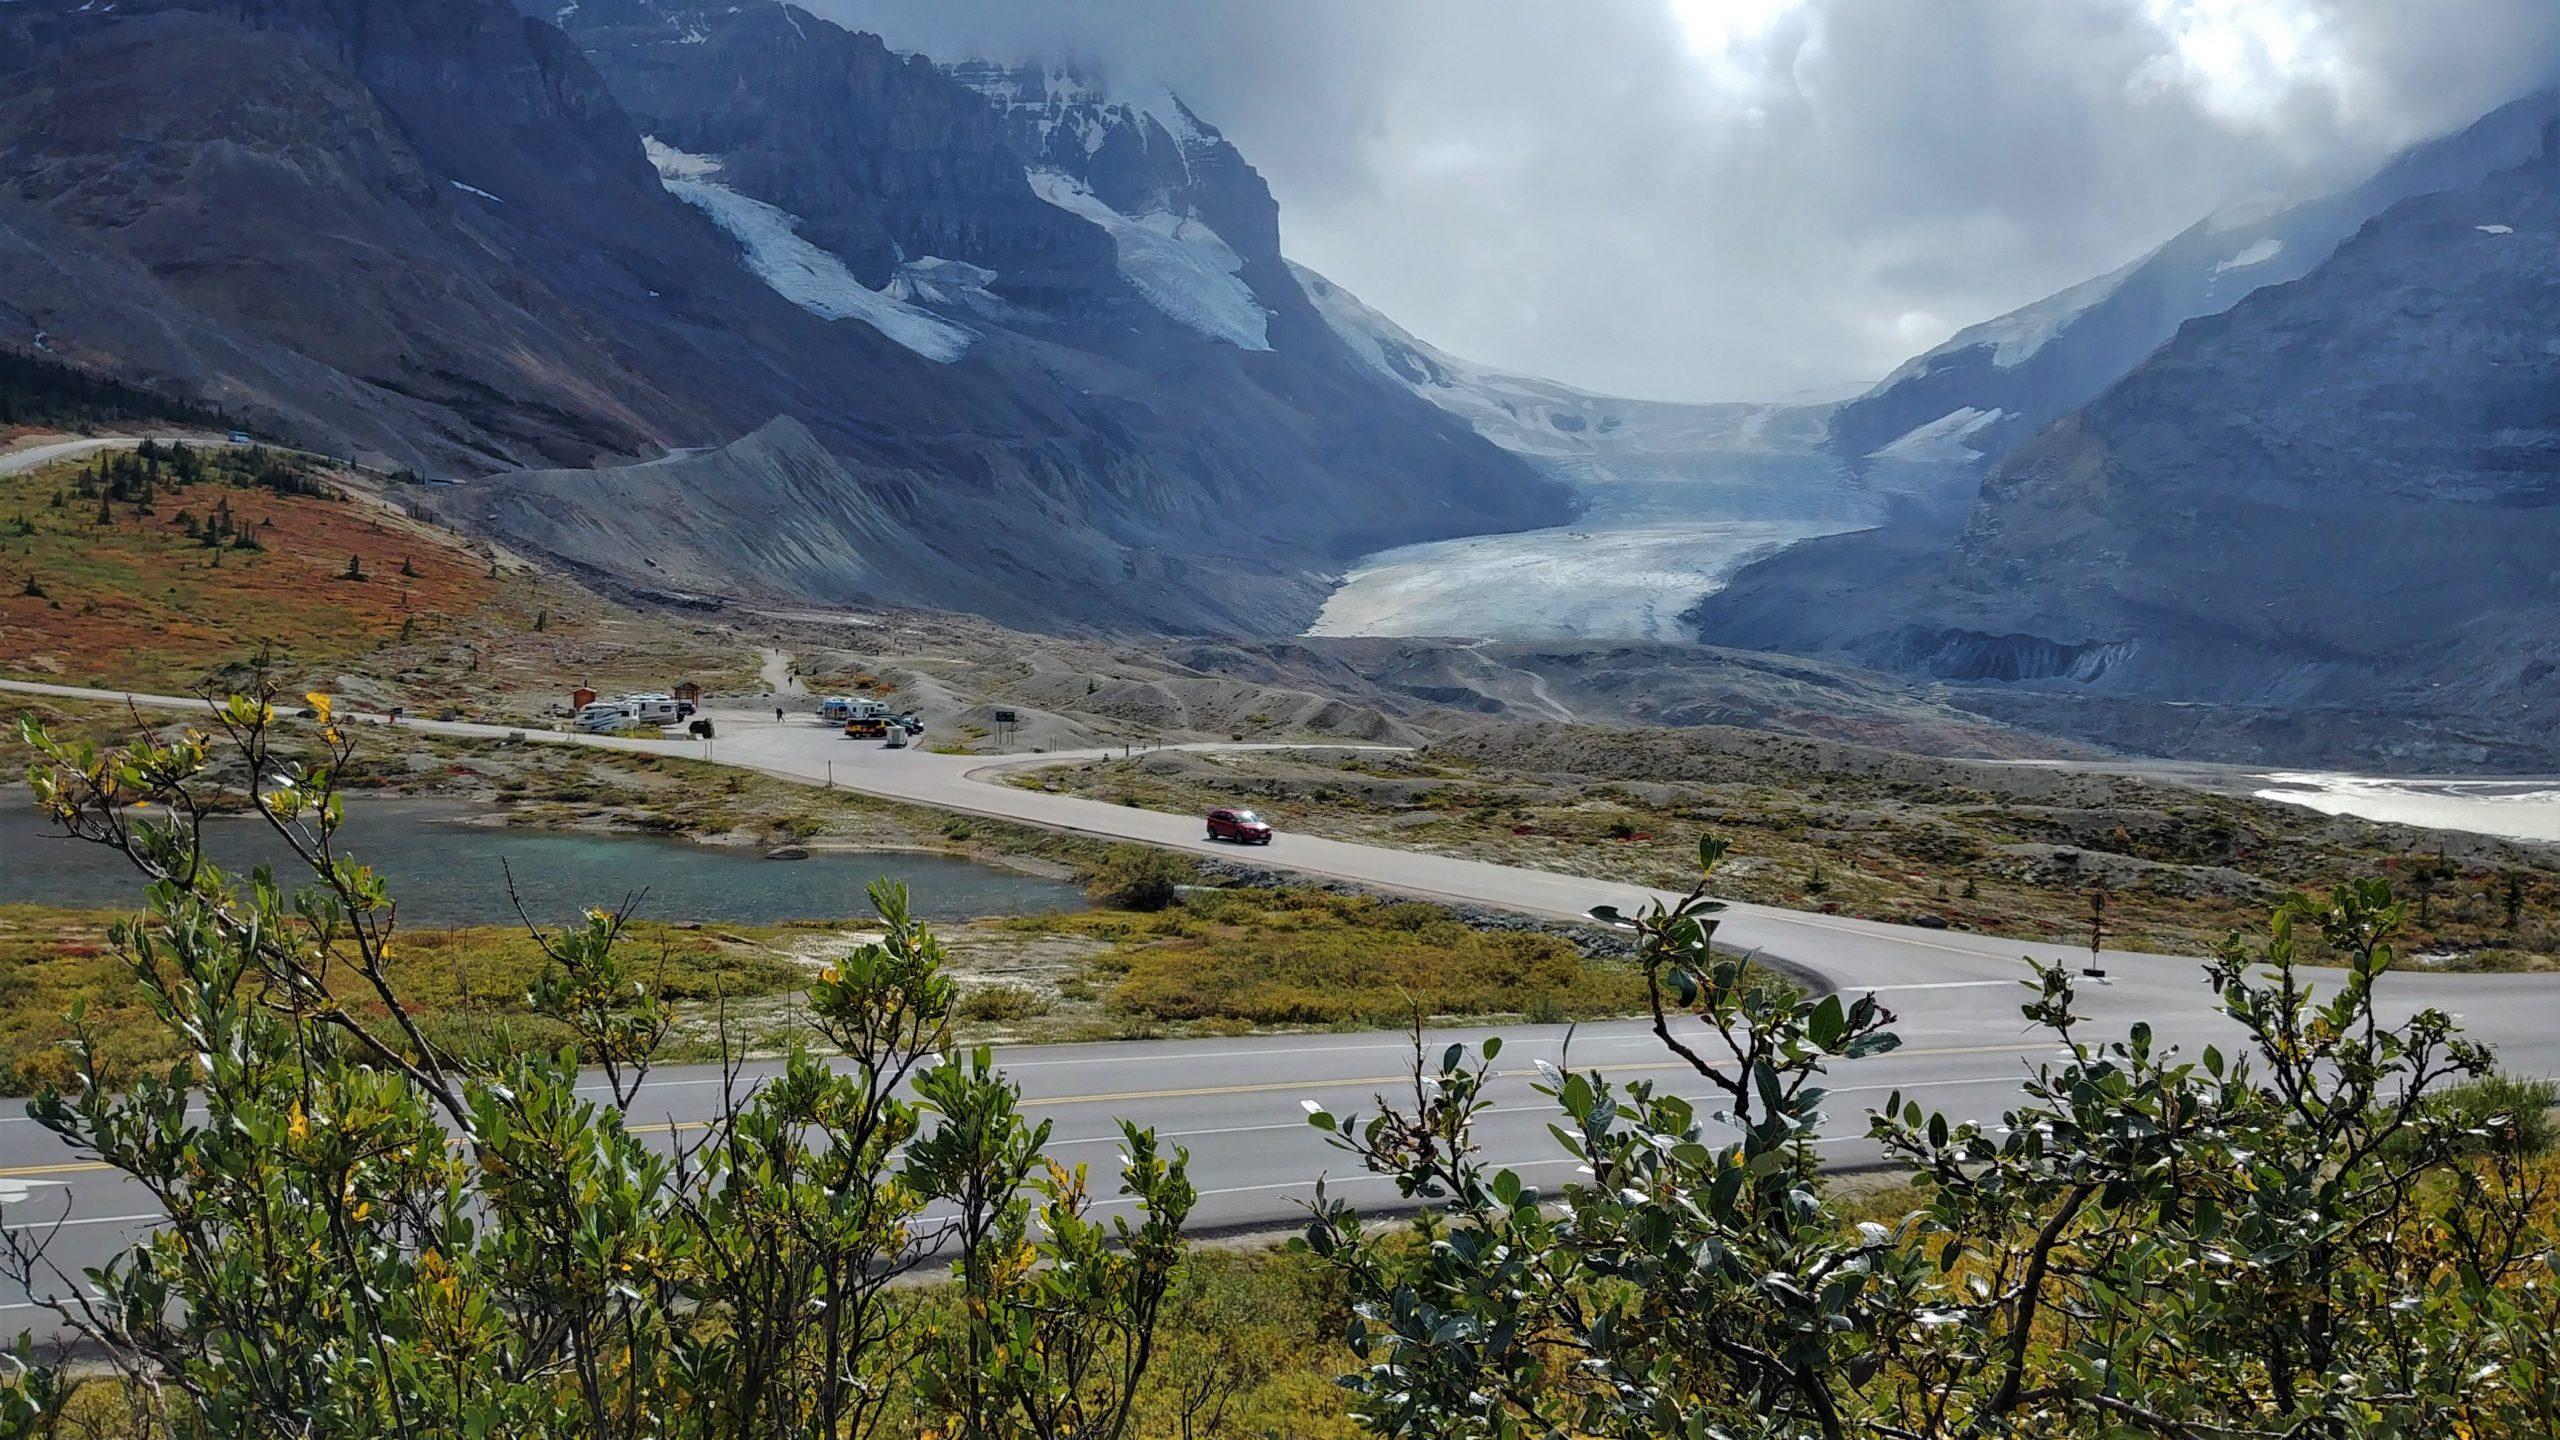 Champ de glace Columbia Promenade des glaciers Icefield PArkway Banff Canada road-trip